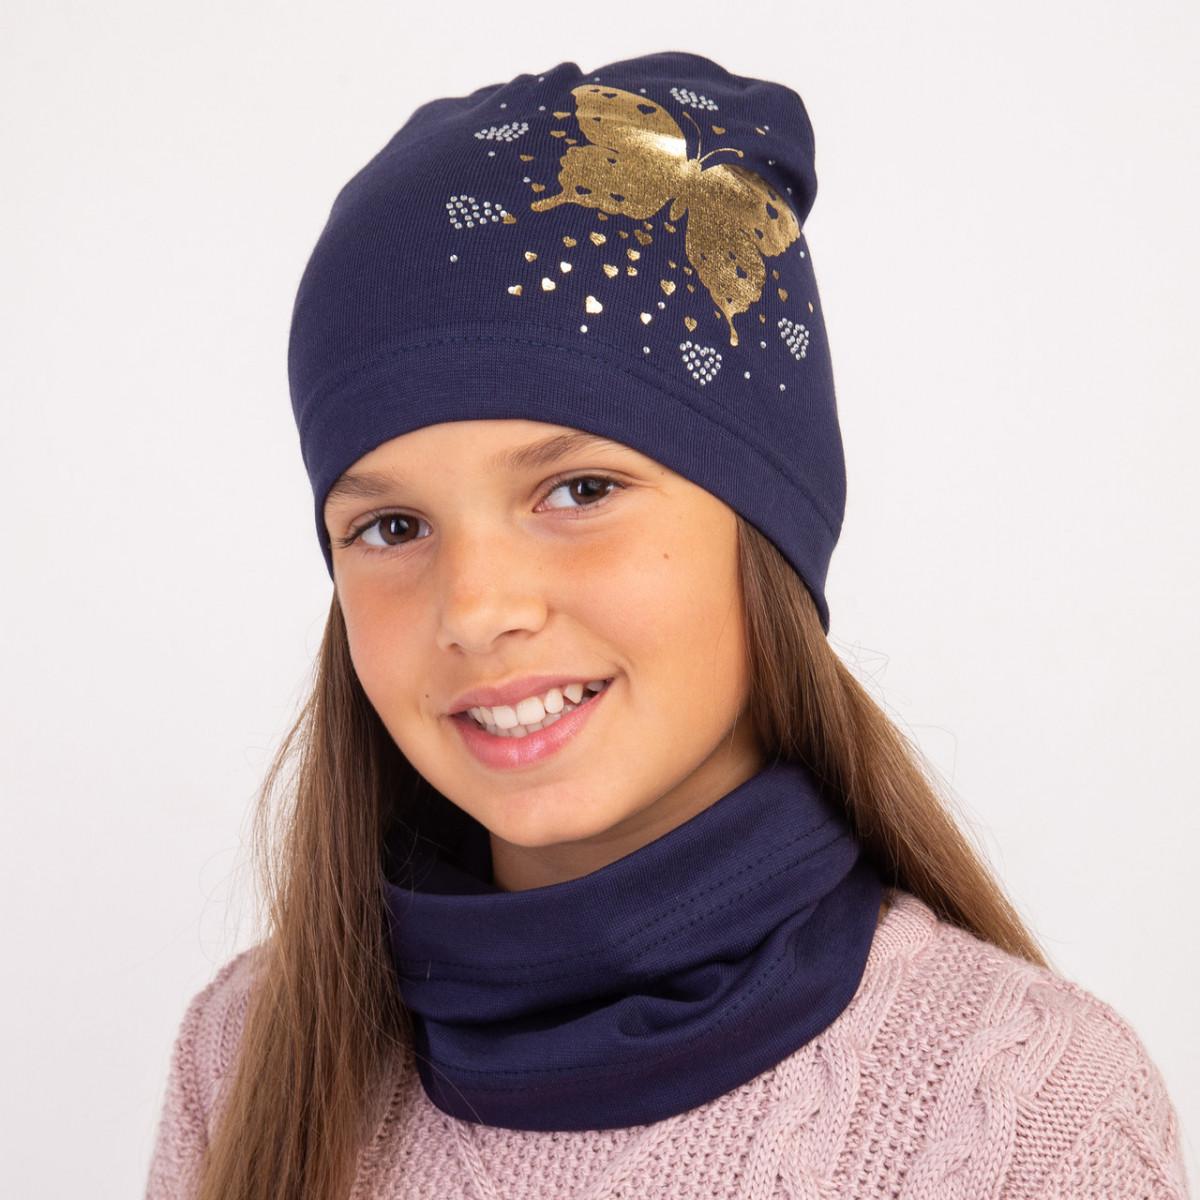 Модный весенний комплект для девочки оптом - Артикул 2259